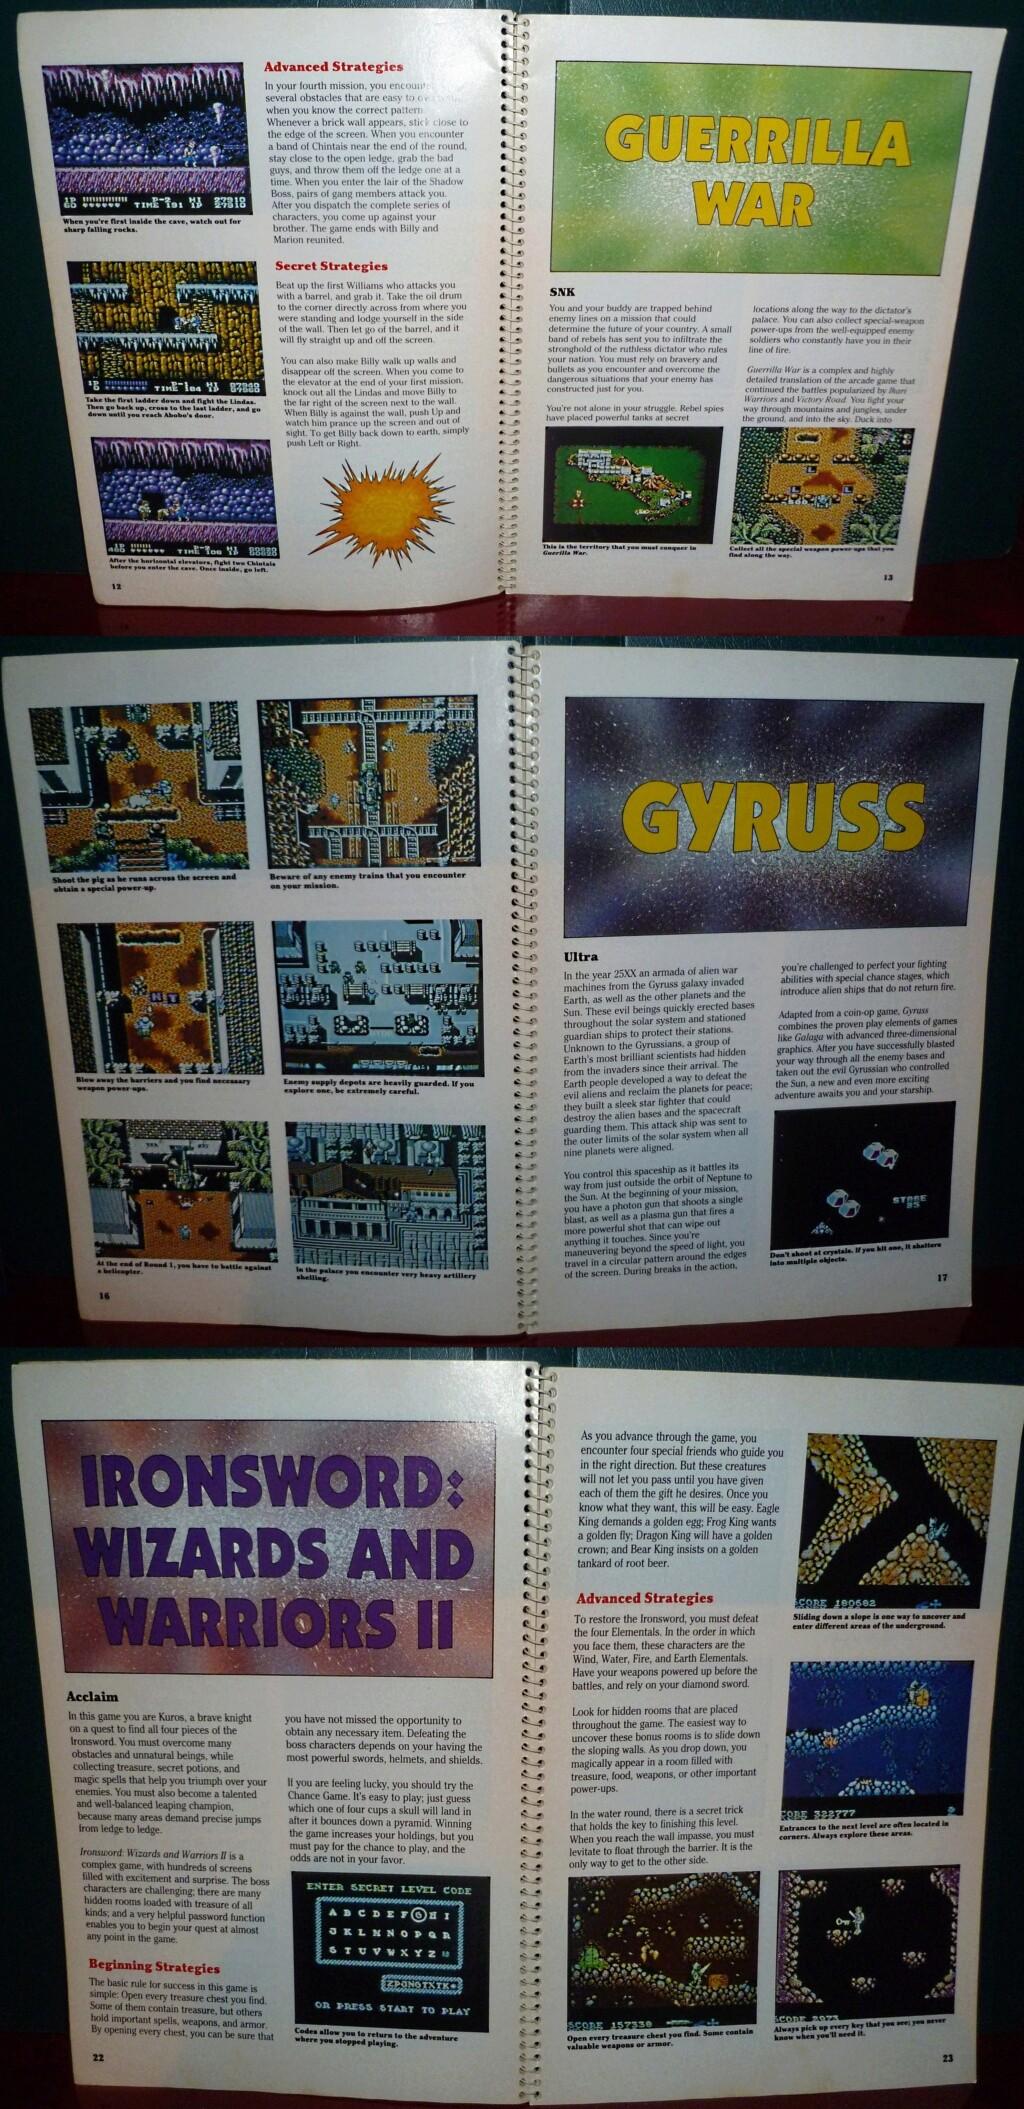 My Video Game Figures & Strategy Guides: Super Godzilla & Predator Games! Book_210